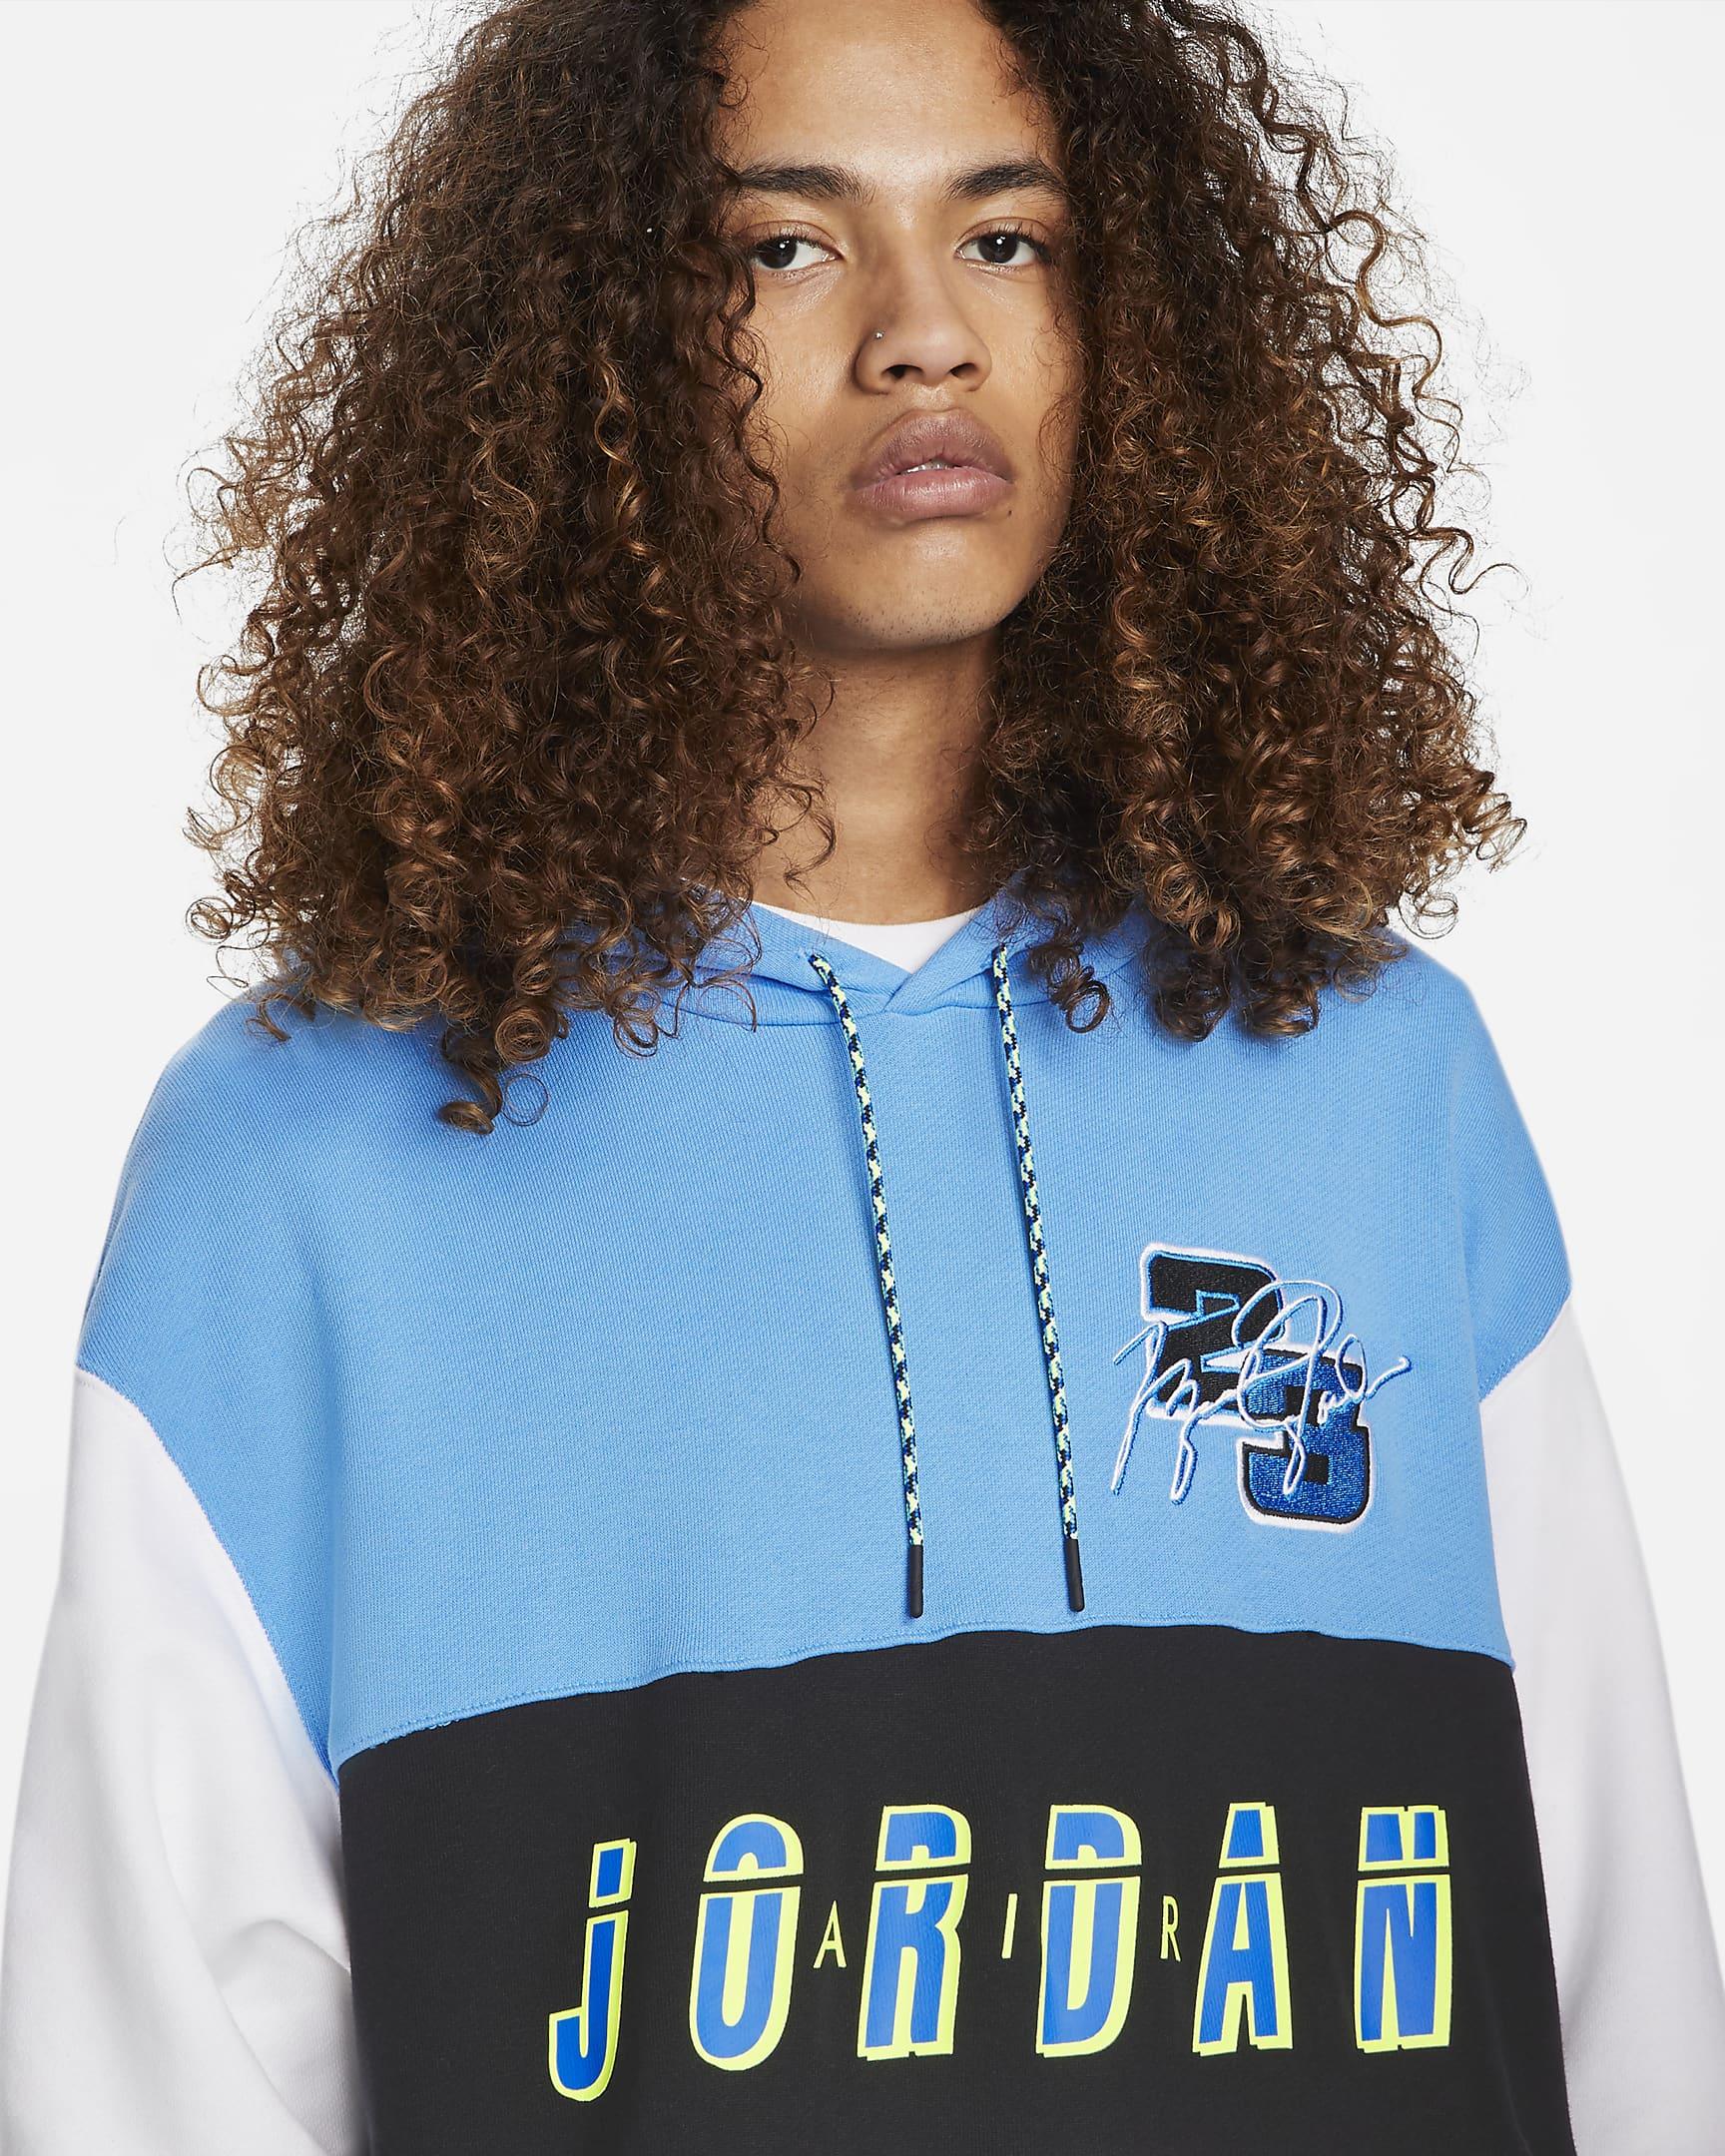 jordan-sport-adna-mens-pullover-hoodie-rMj8Rw-3